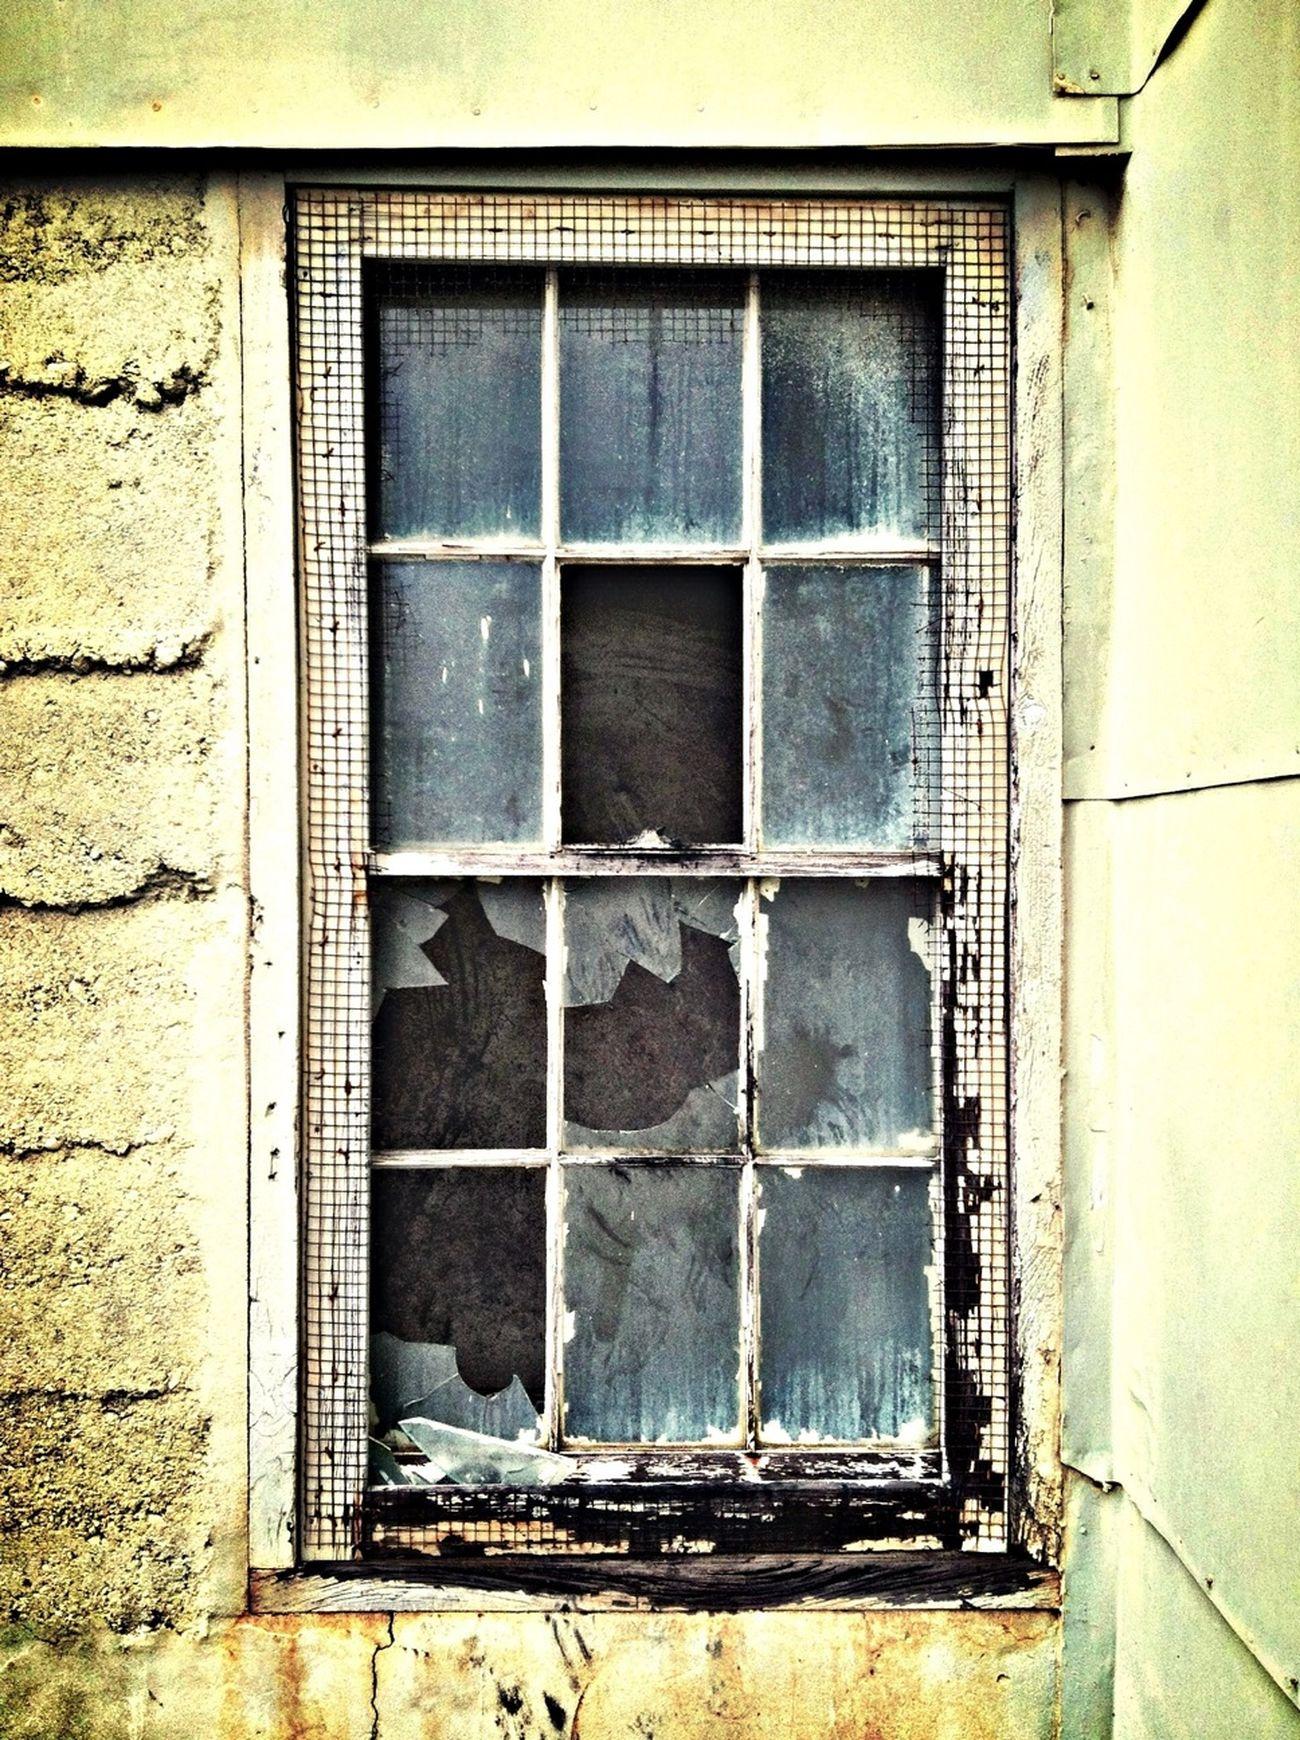 Streetphotography Abandoned Building Window